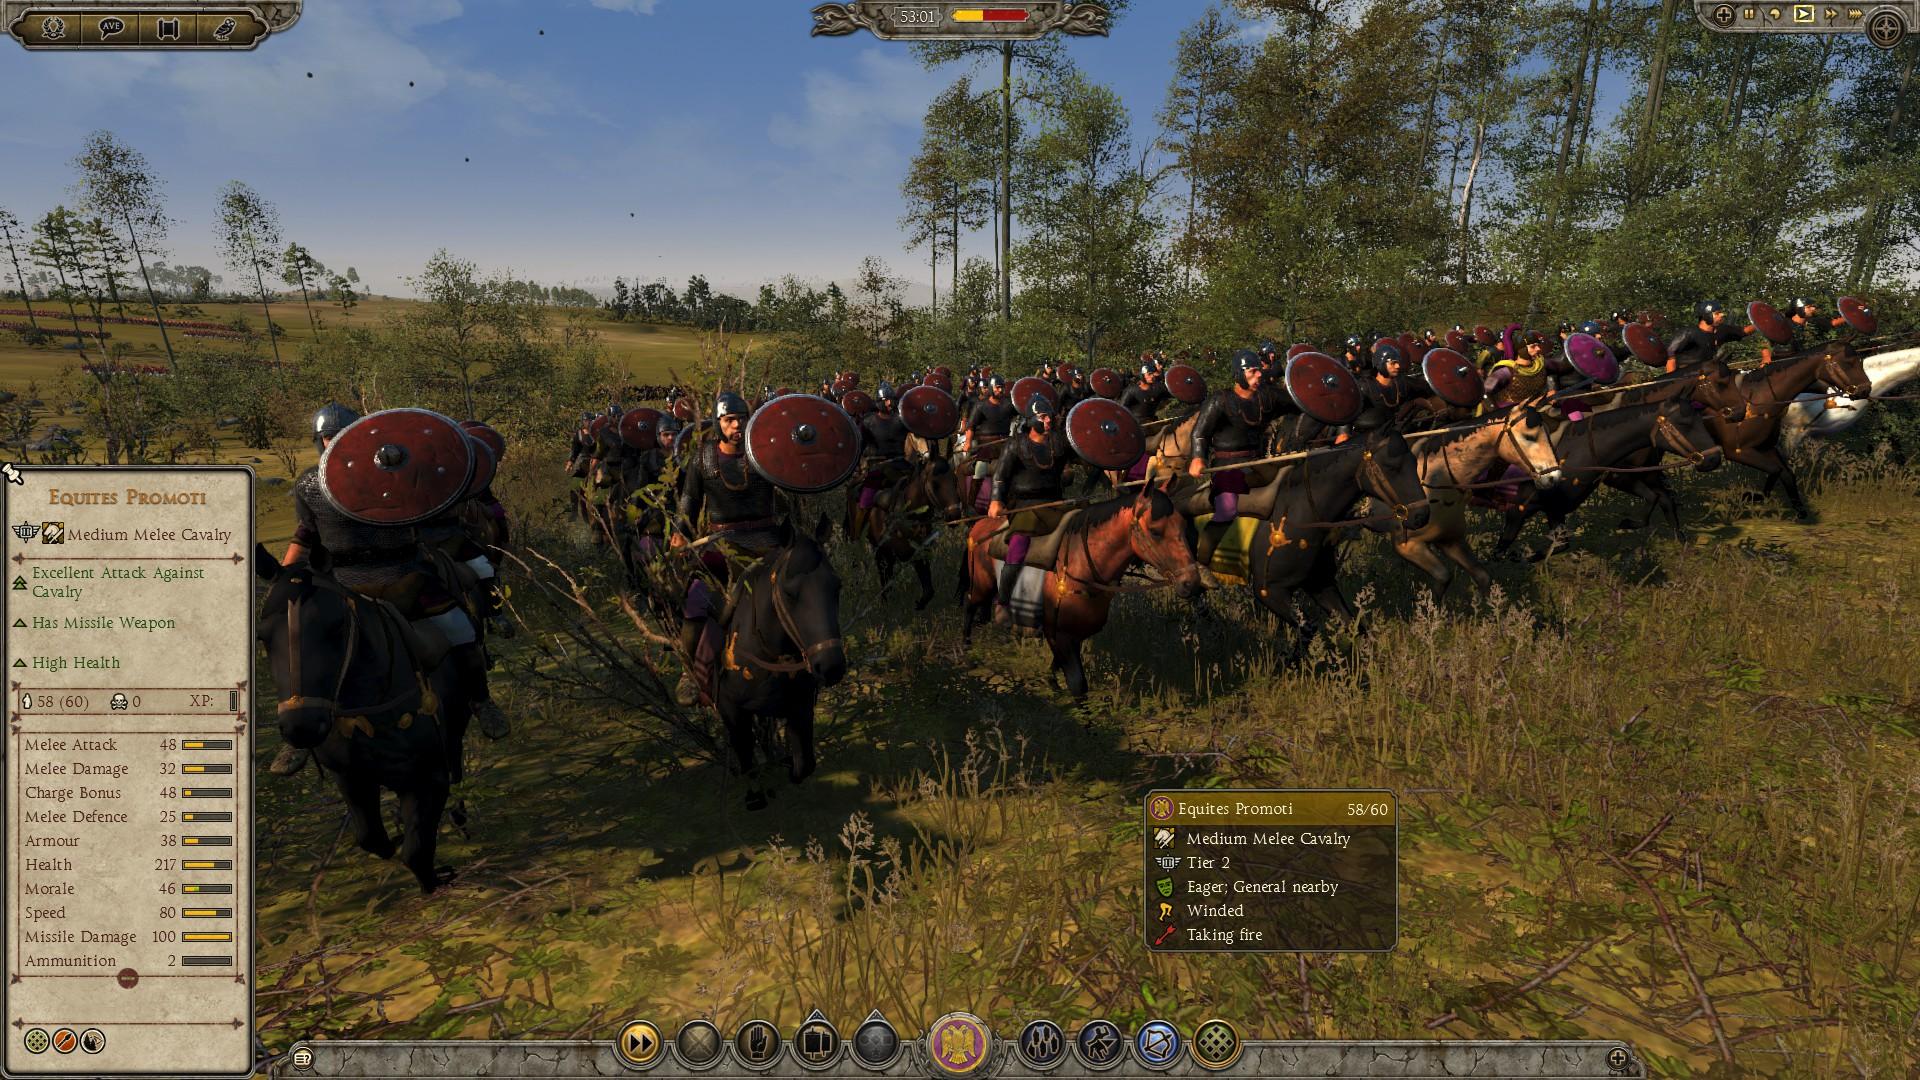 Equites Promoti - Western Roman Empire - Total War: Attila - Royal